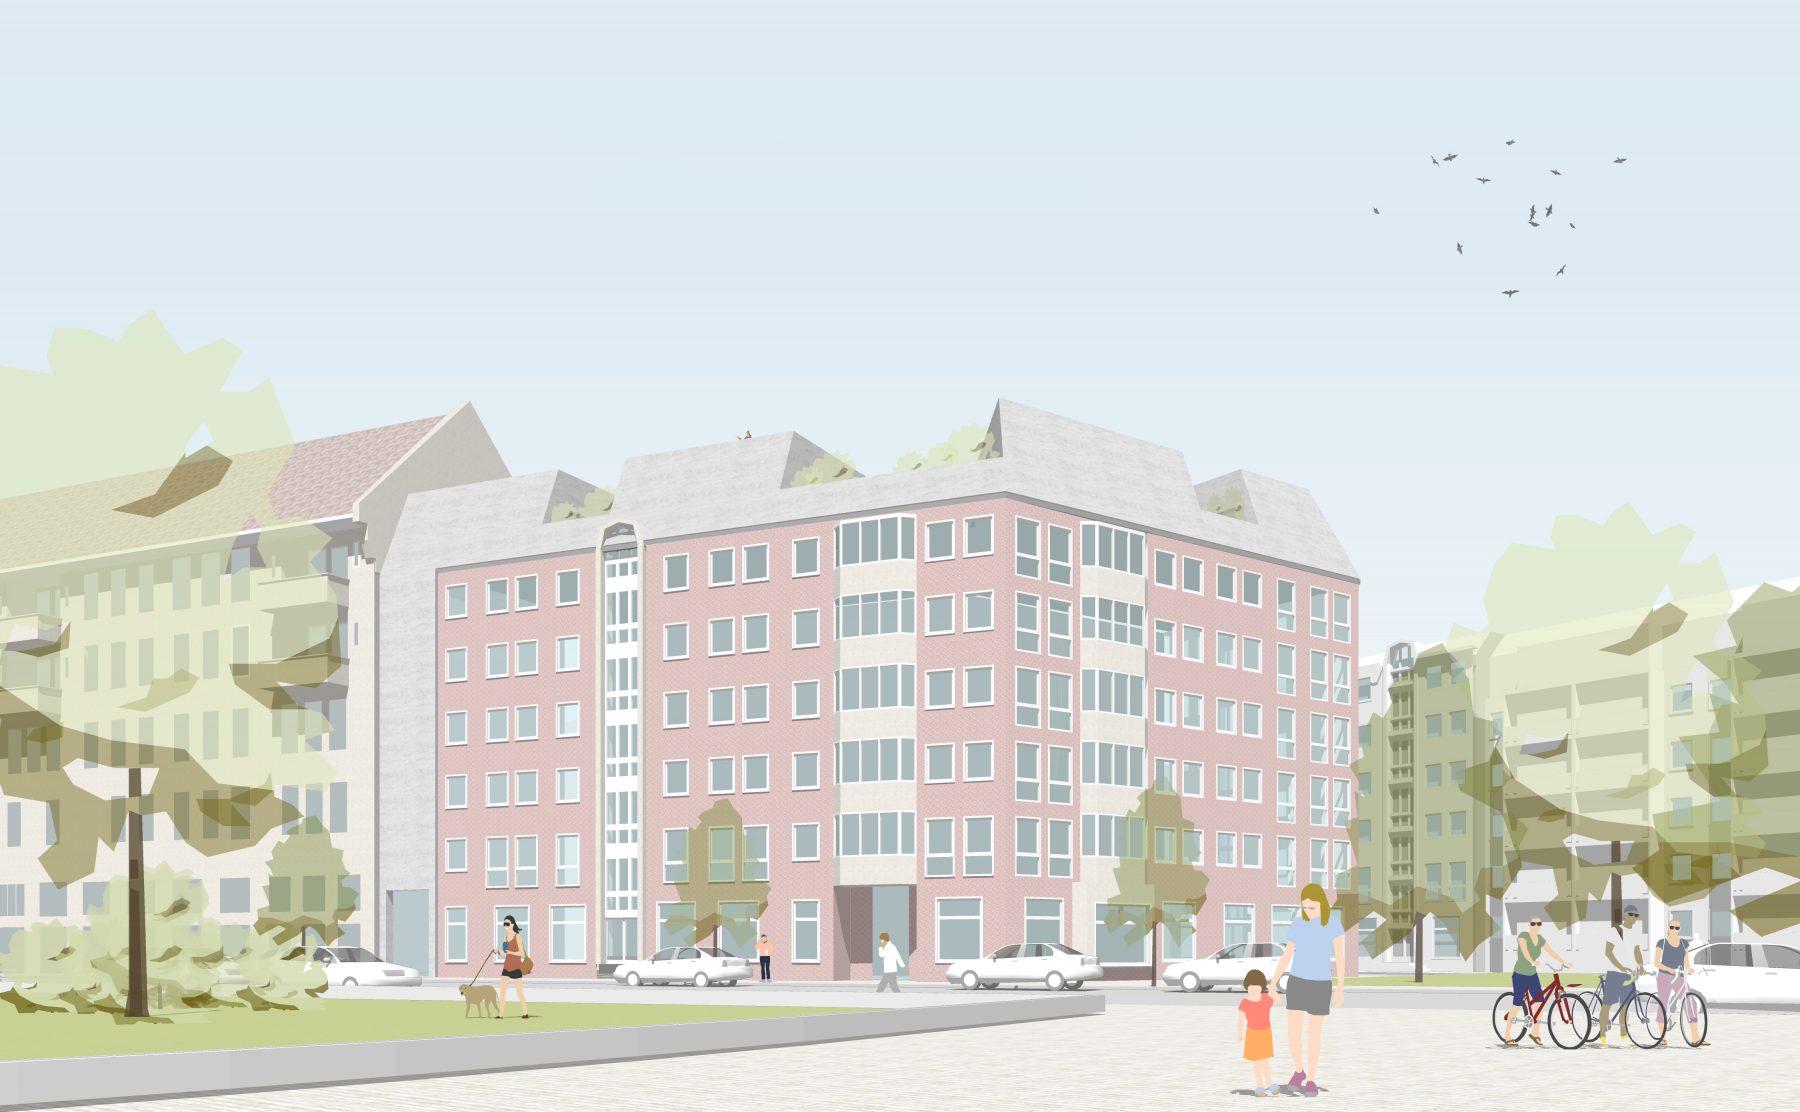 Almstadtstrasse dachgeschoss bundschuh architekten - Architekturburo berlin ...